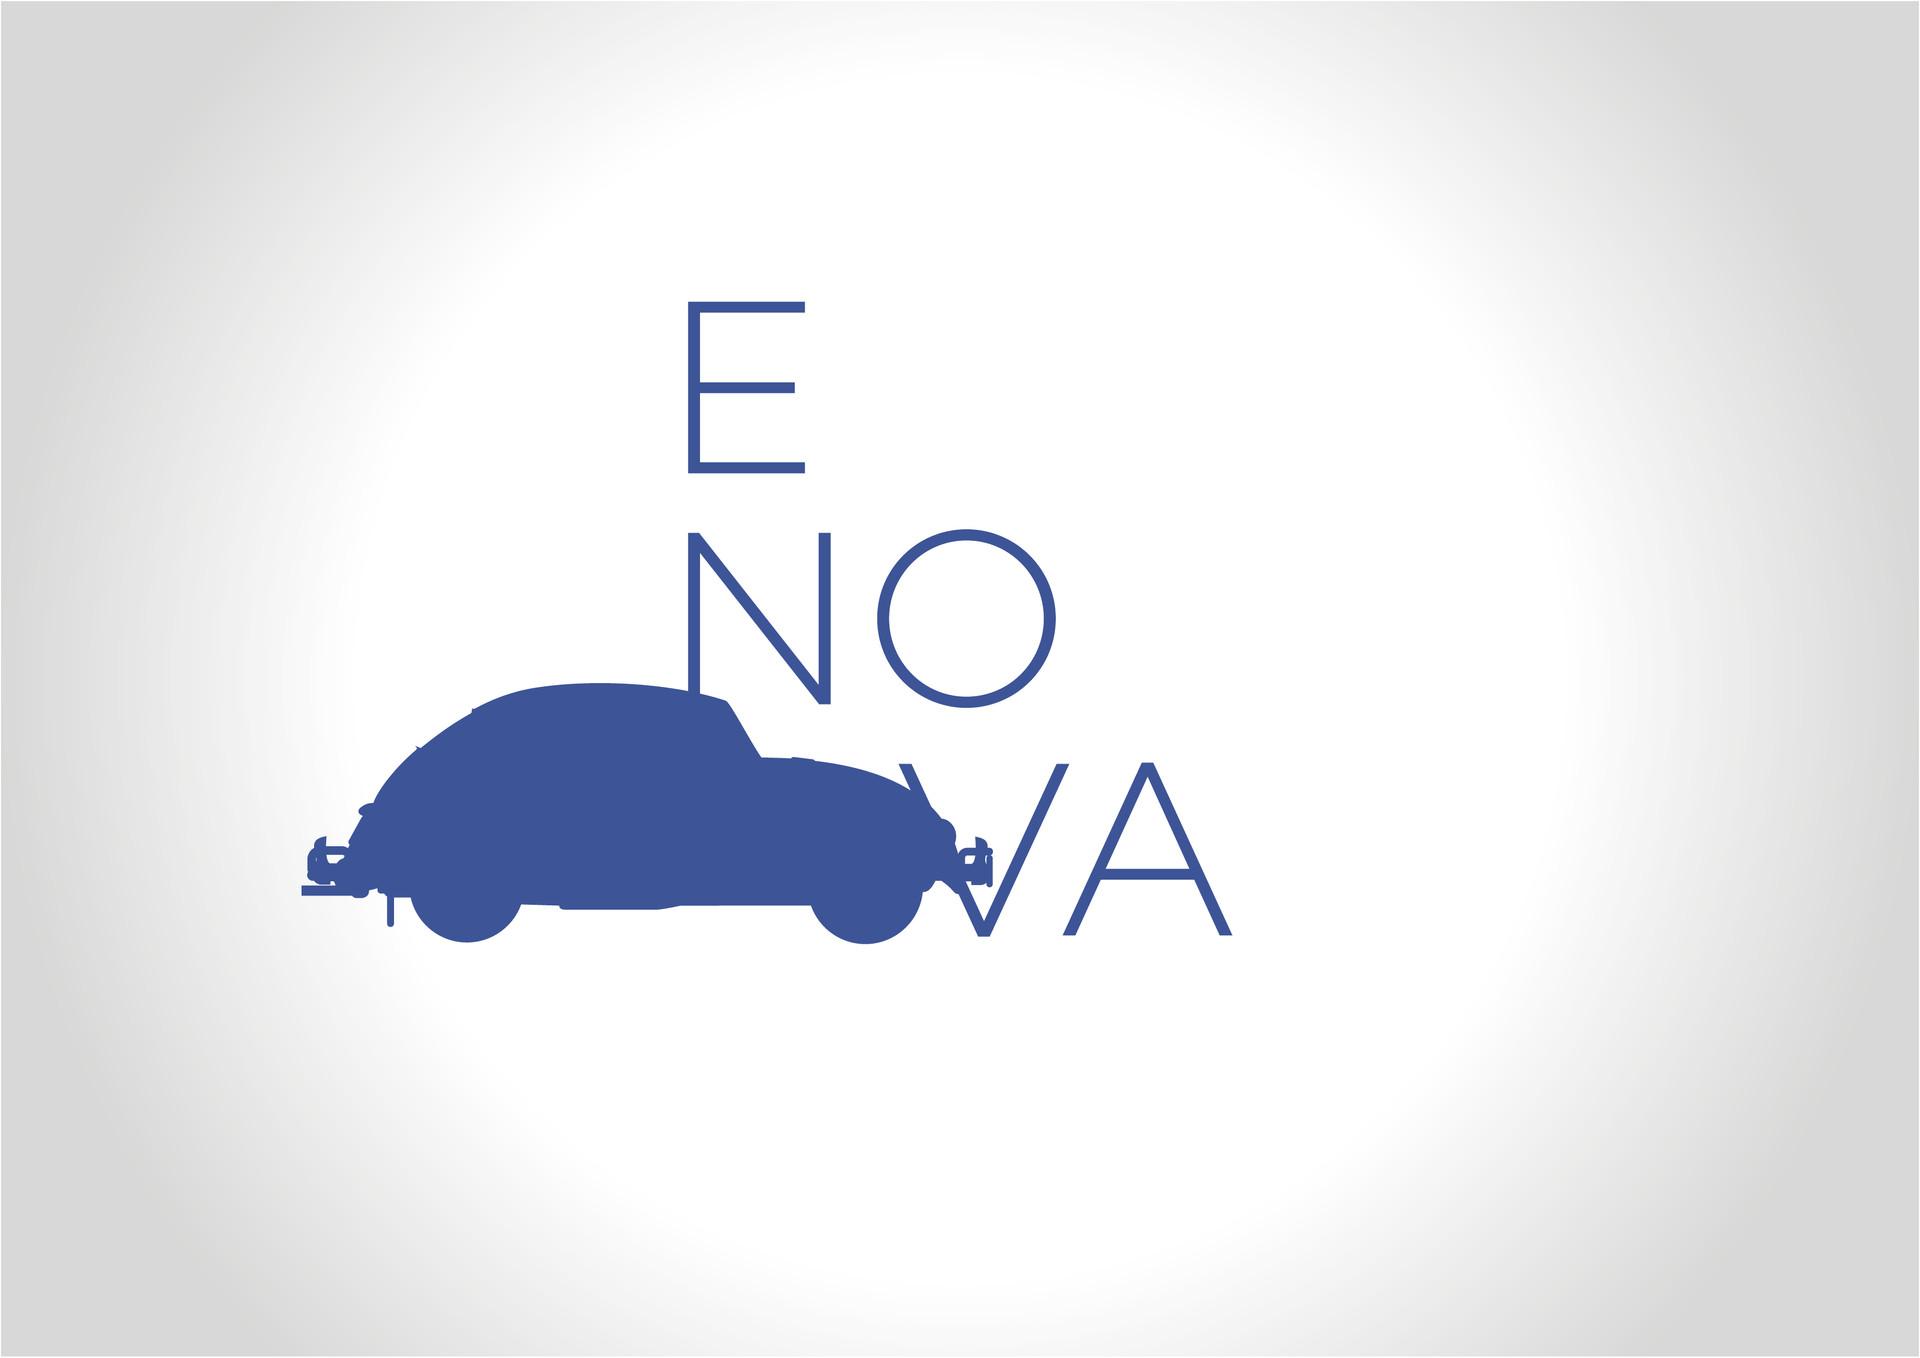 Enova_Escola_Nova_logo_4.jpg